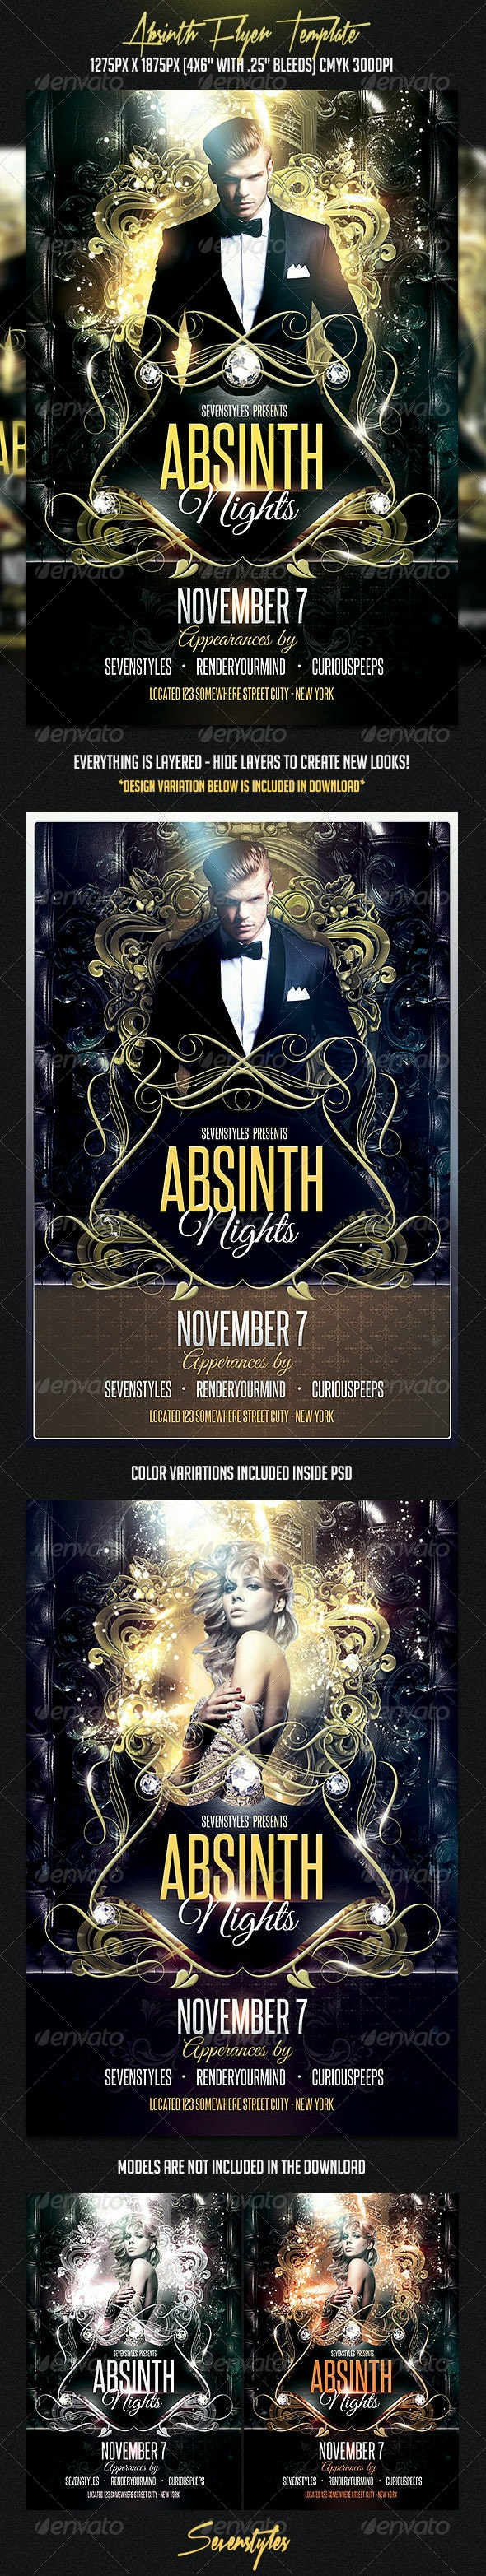 Absinth Flyer Template - Flyers Print Templates